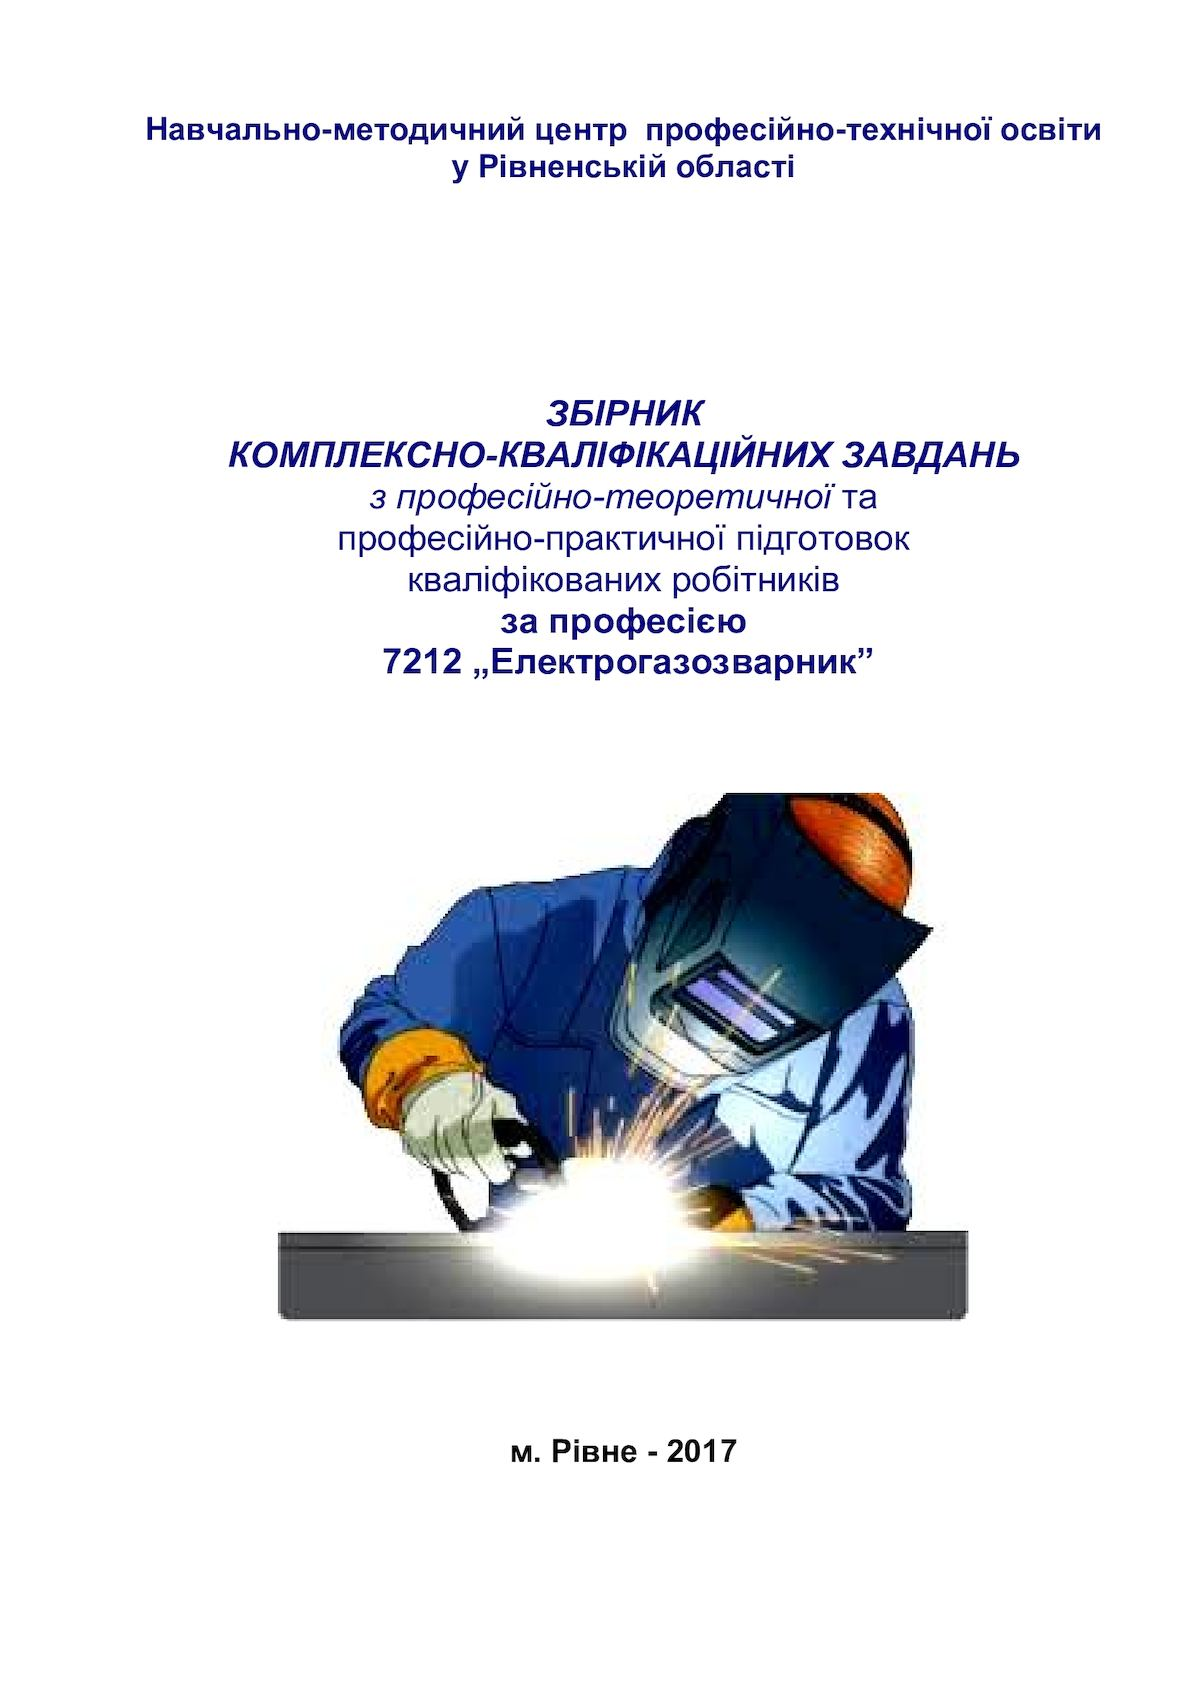 "Збірник ККЗ за професією ""Електрогазозварник"""